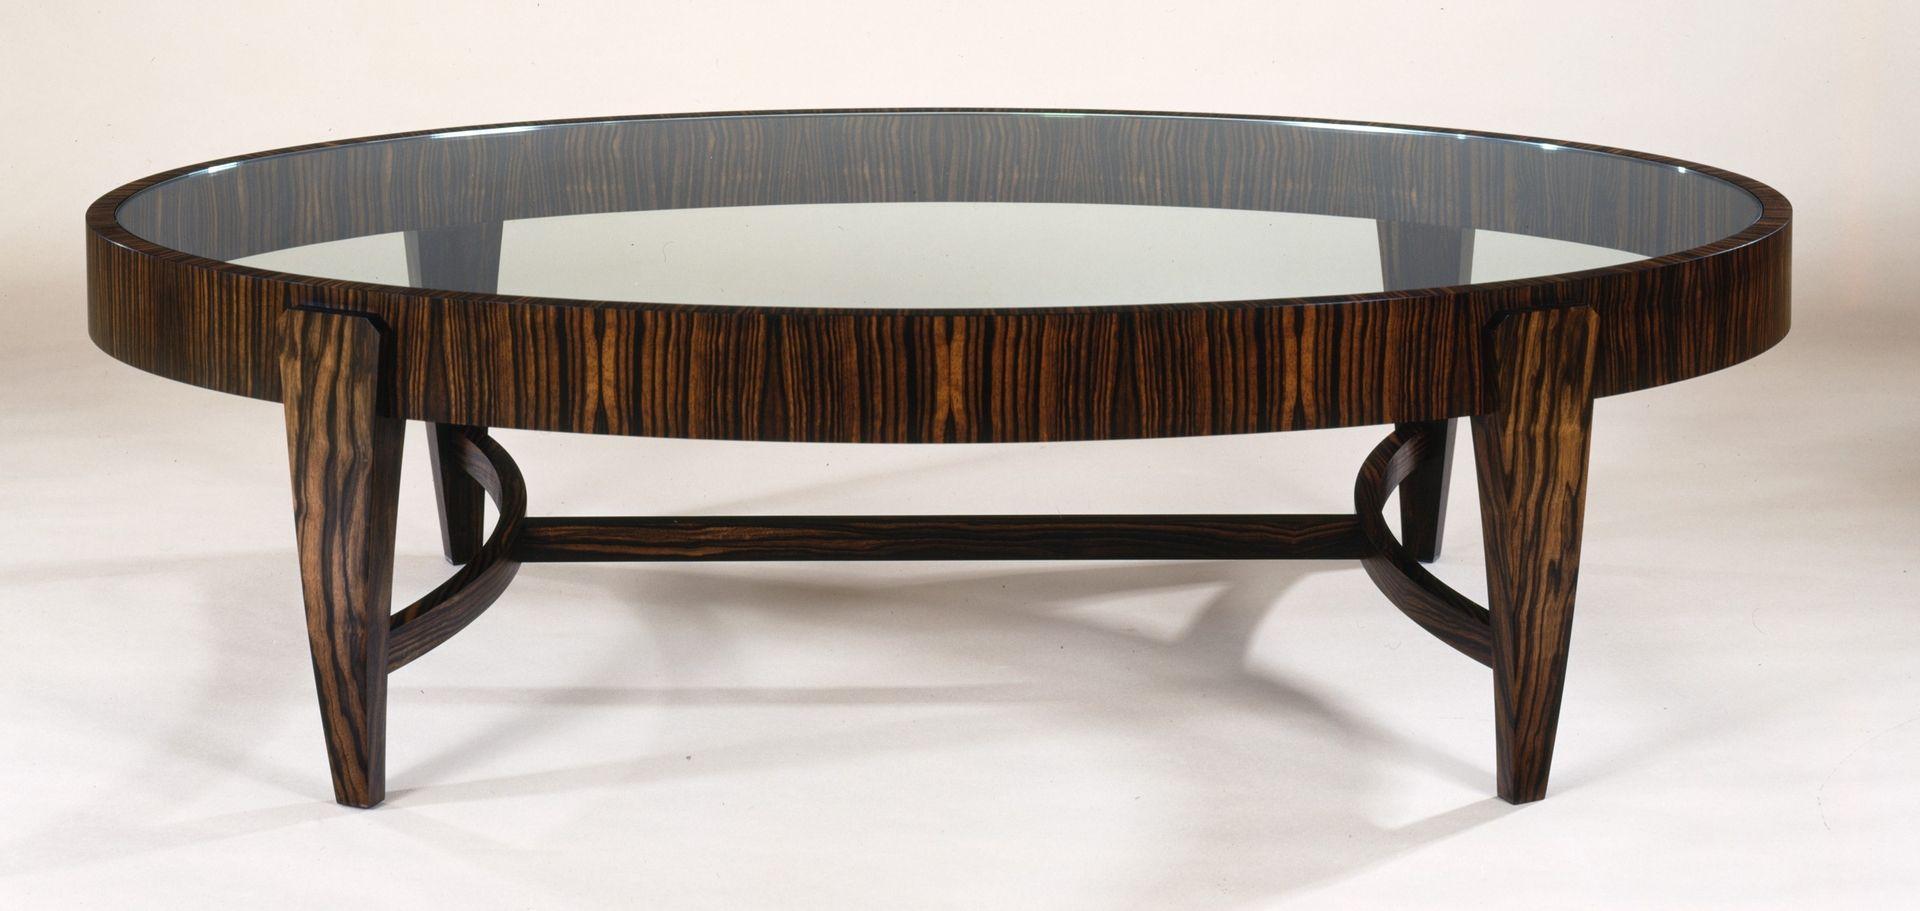 Custom tusk oval coffee table by gregg lipton furniture for Oval farmhouse coffee table